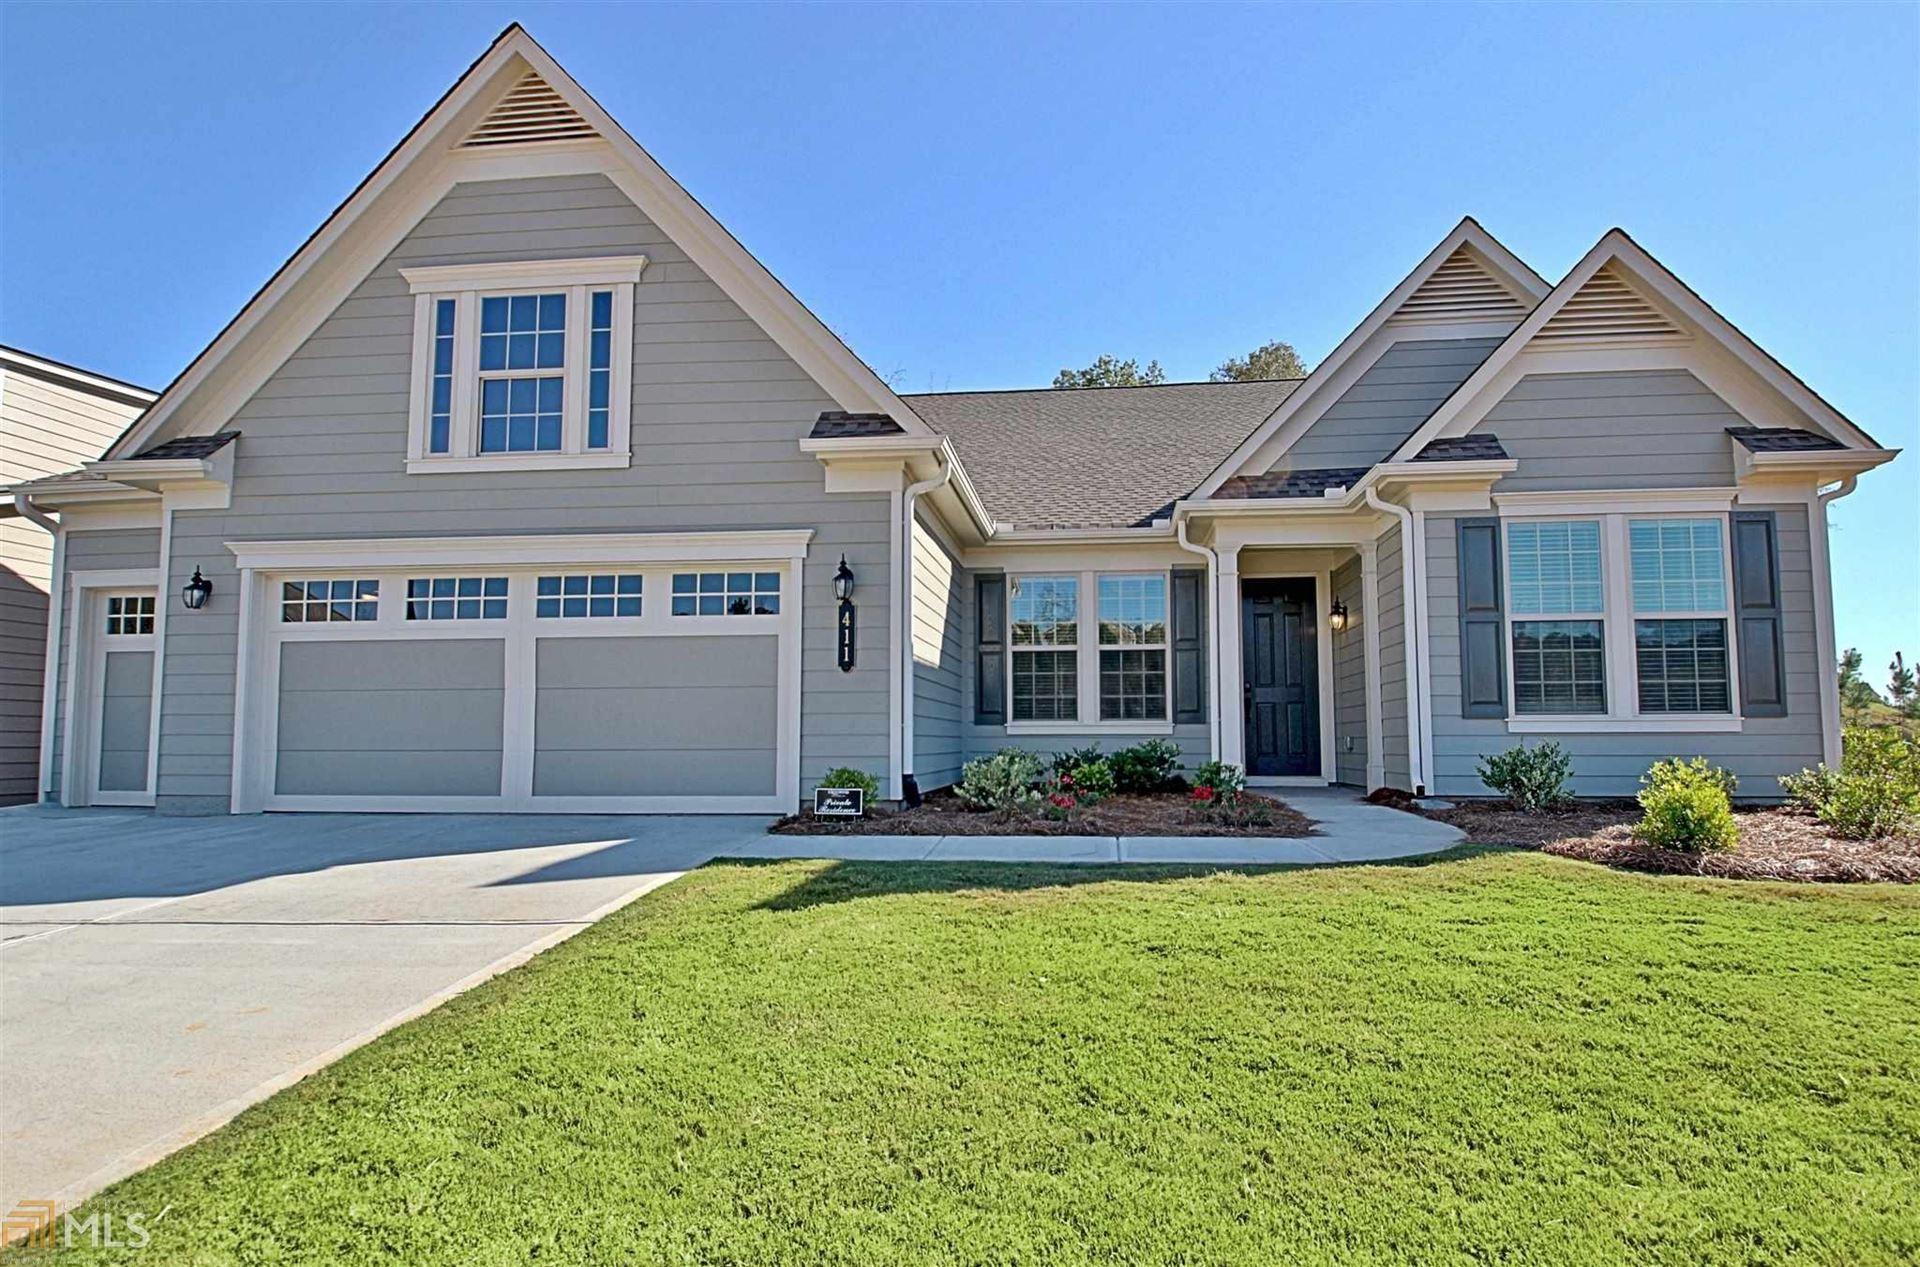 411 Cottonwood Cir, Peachtree City, GA 30269 - MLS#: 8884615